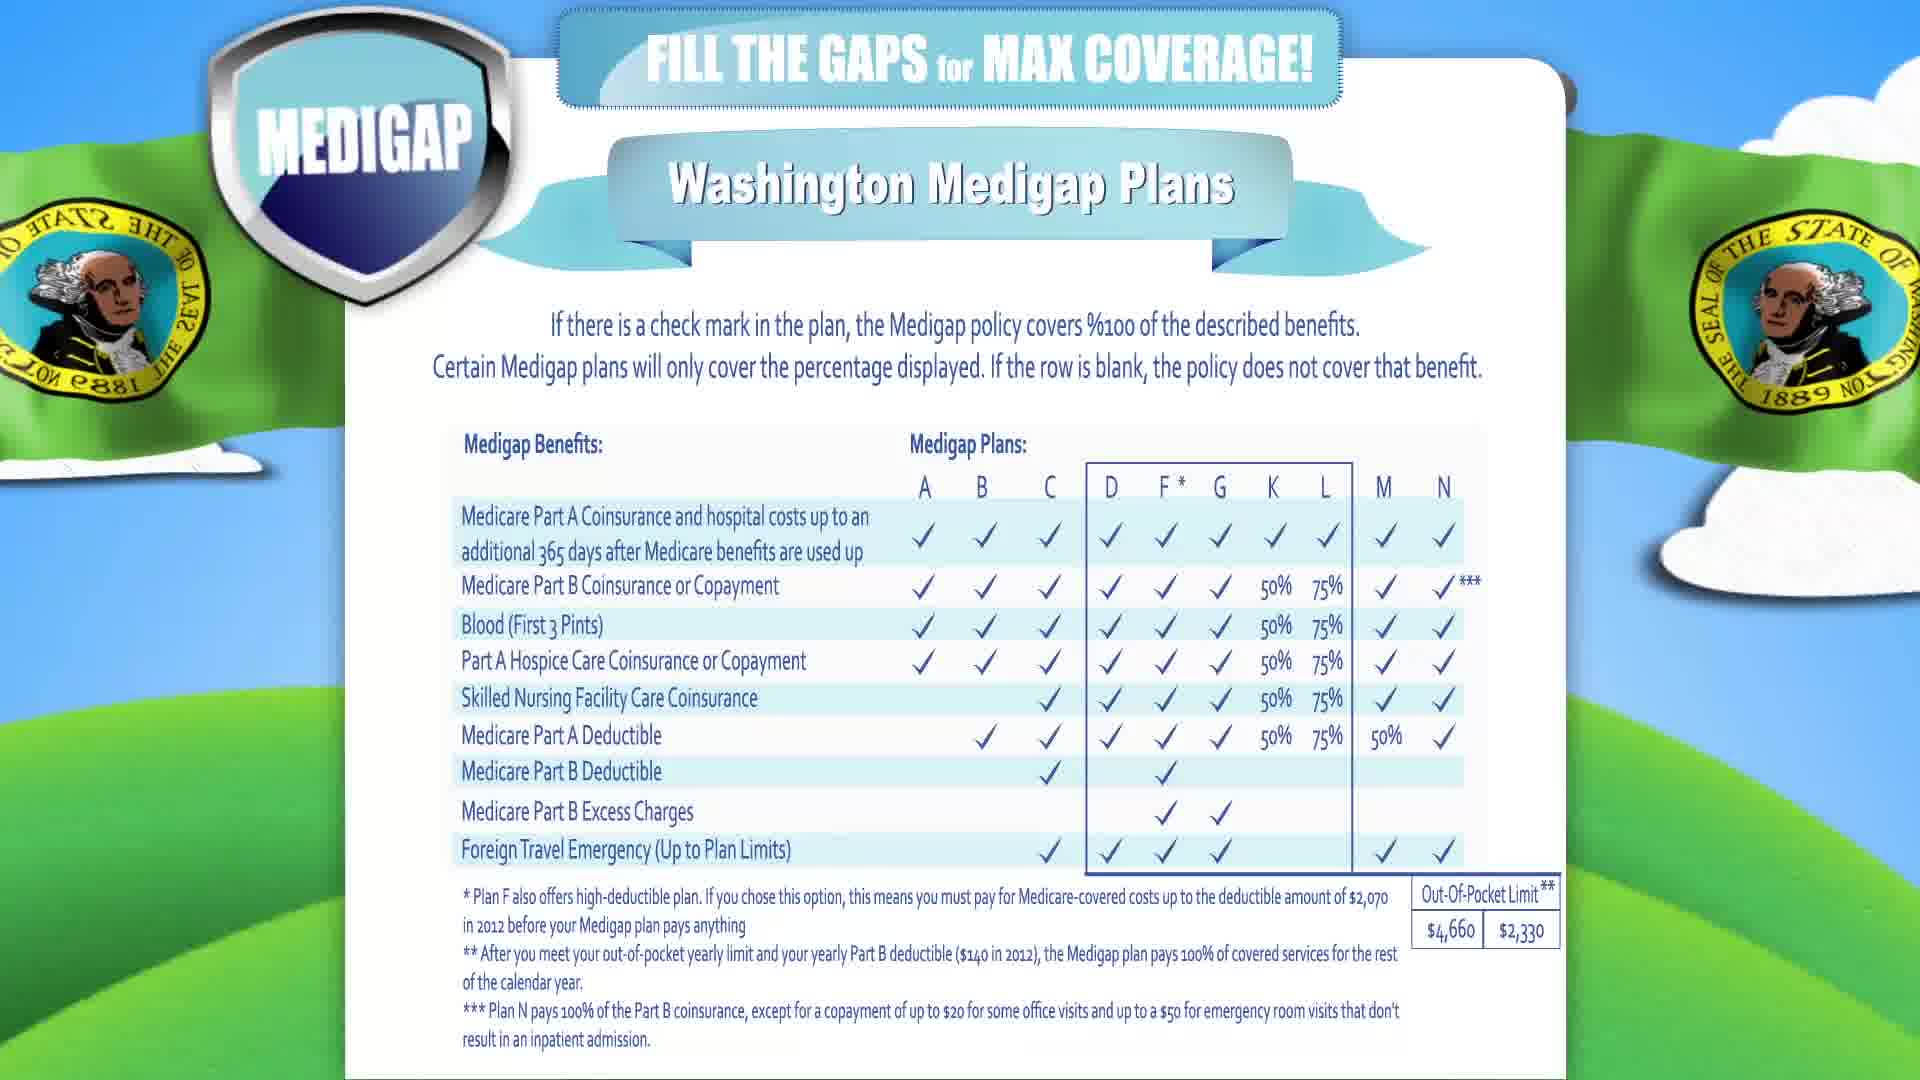 #WashingtonMedicareInsurance